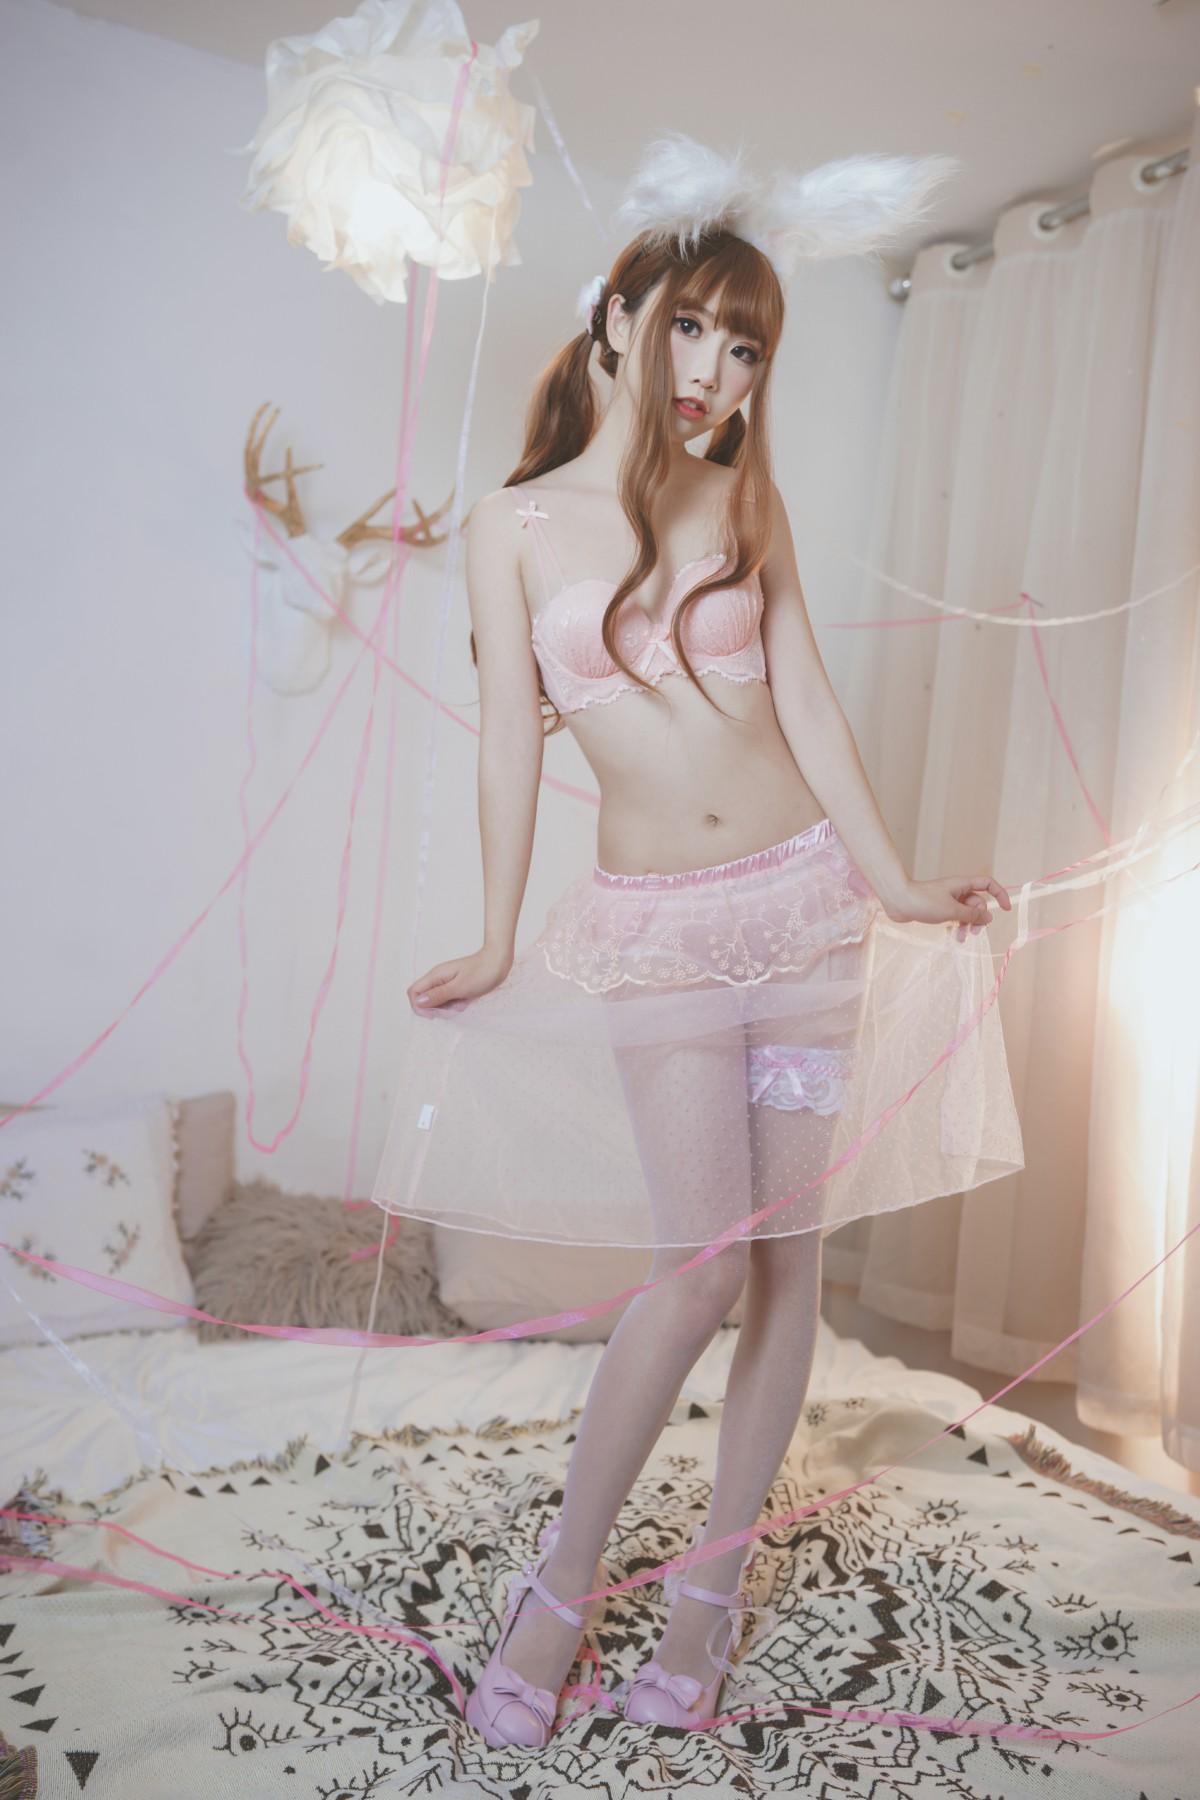 Coser面饼仙儿 – 粉粉红红[17P] 角色扮演 第3张